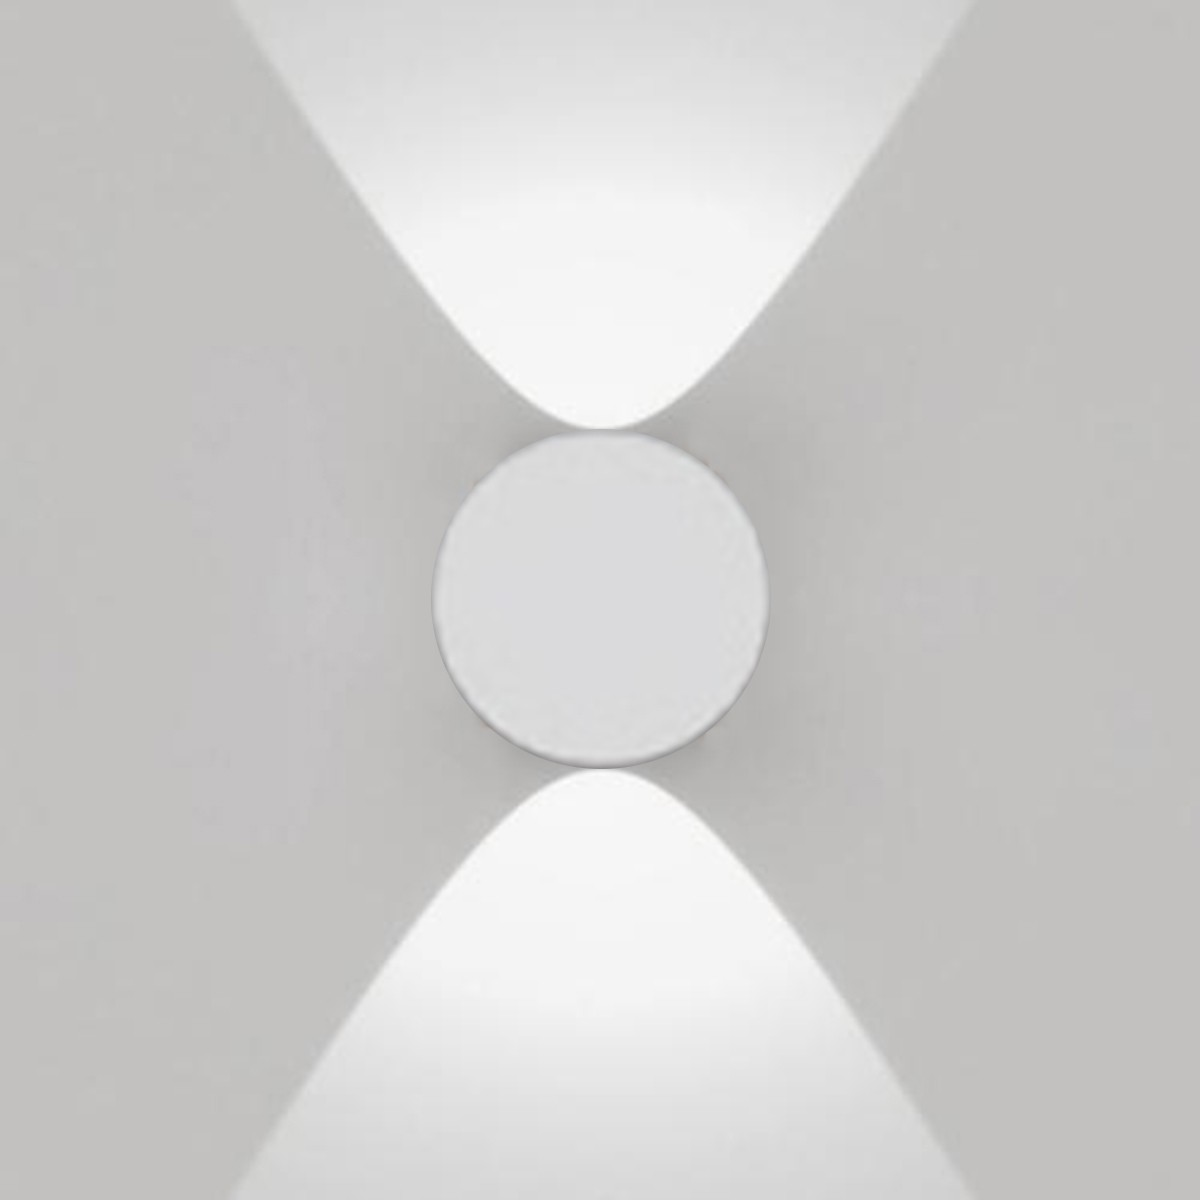 Artemide Outdoor Effetto 16R Wandleuchte 2L, 2 x 40°, hellgrau, 3000° K